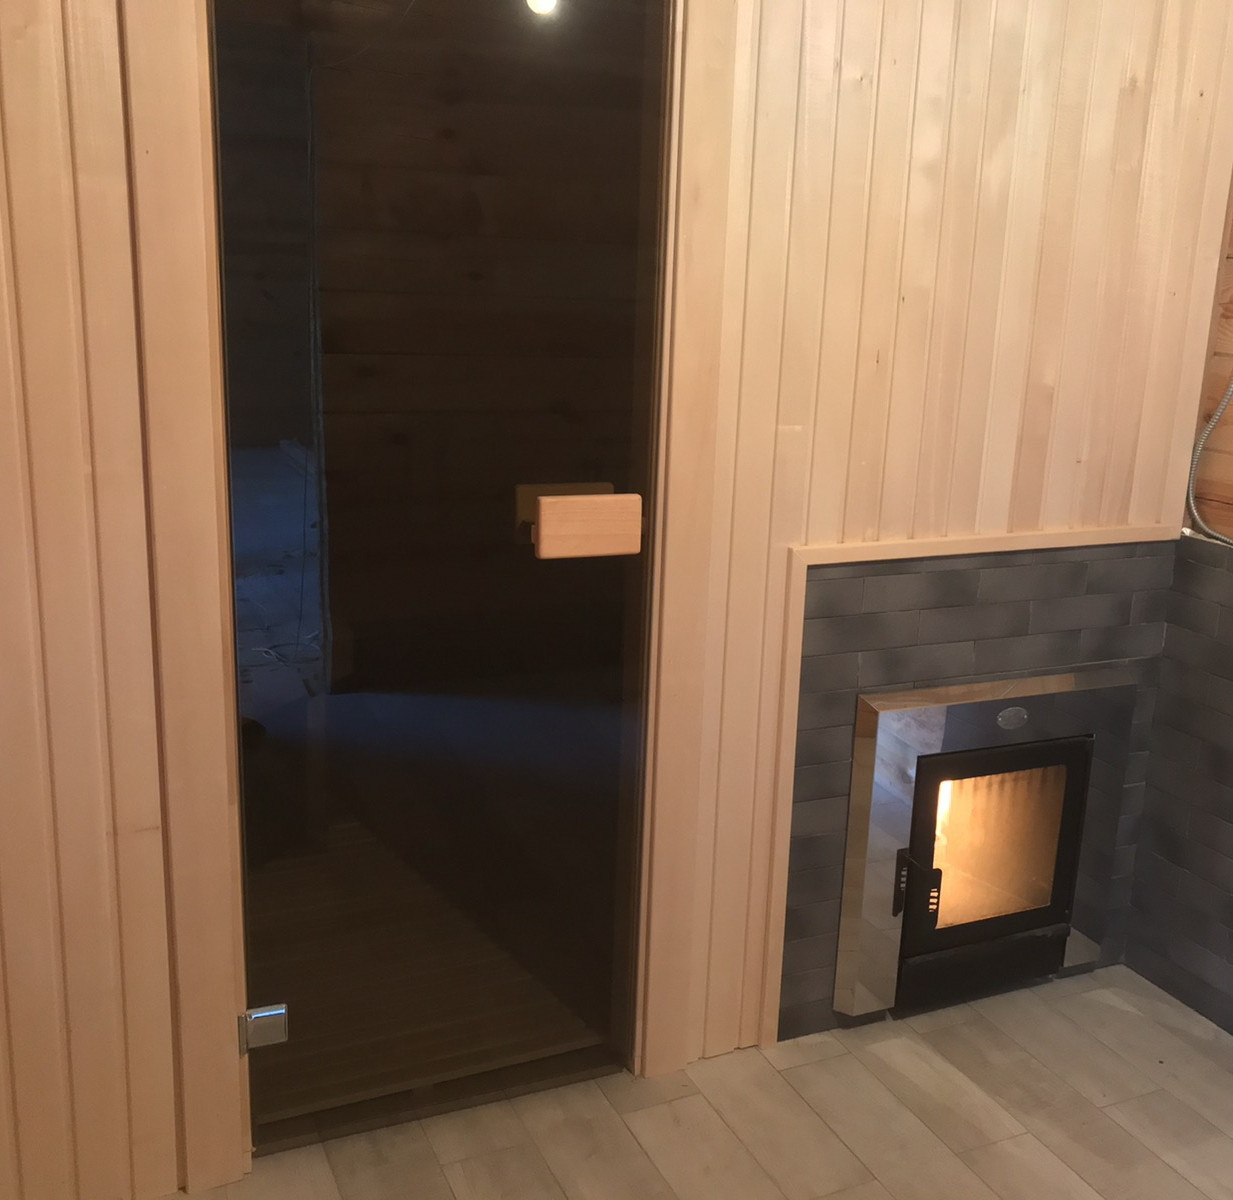 Баня под ключ 1500*2000мм с дровяной каменкой и дымоходом